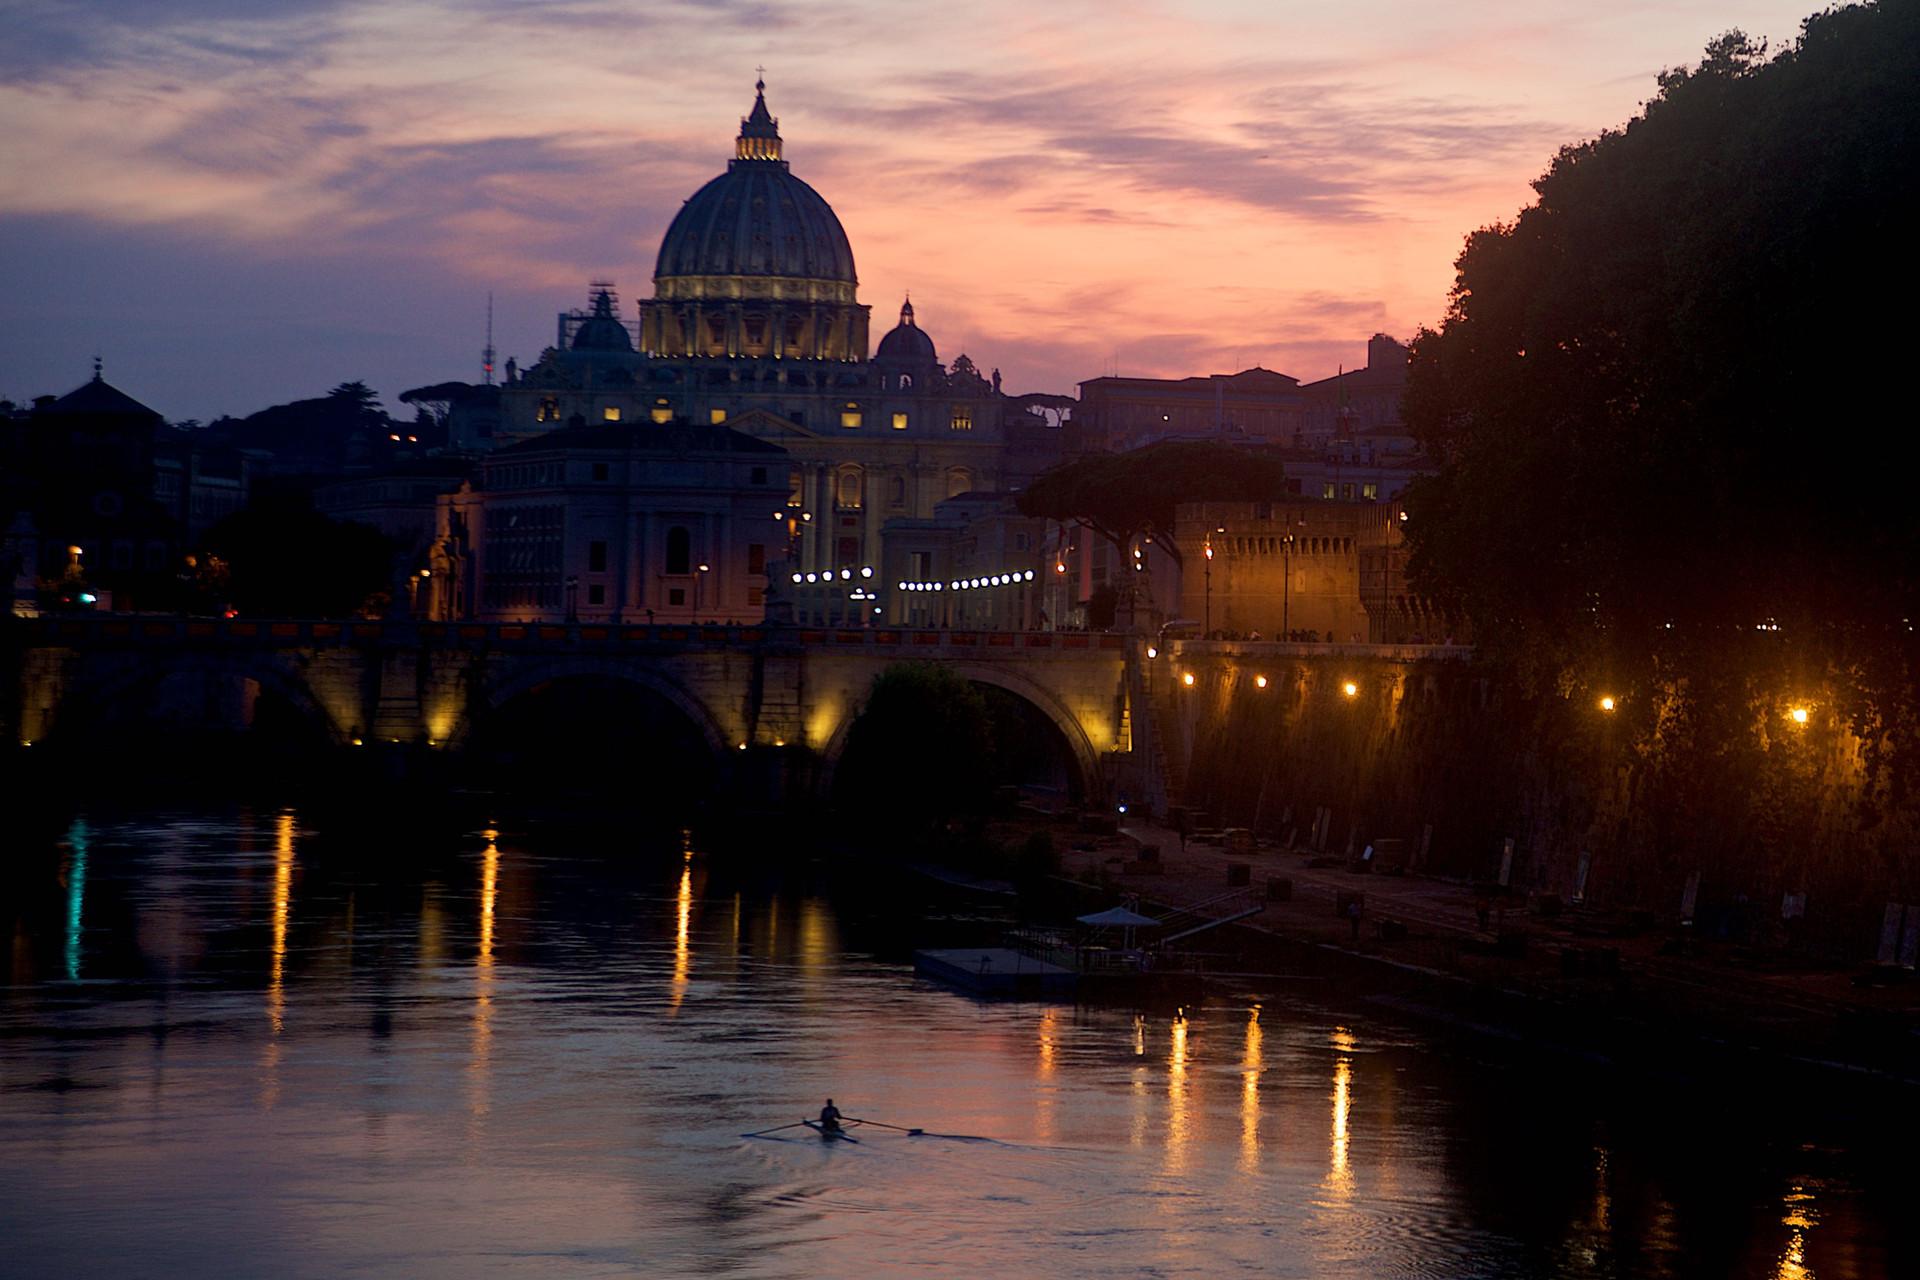 Sunrise on St. Peter's Church